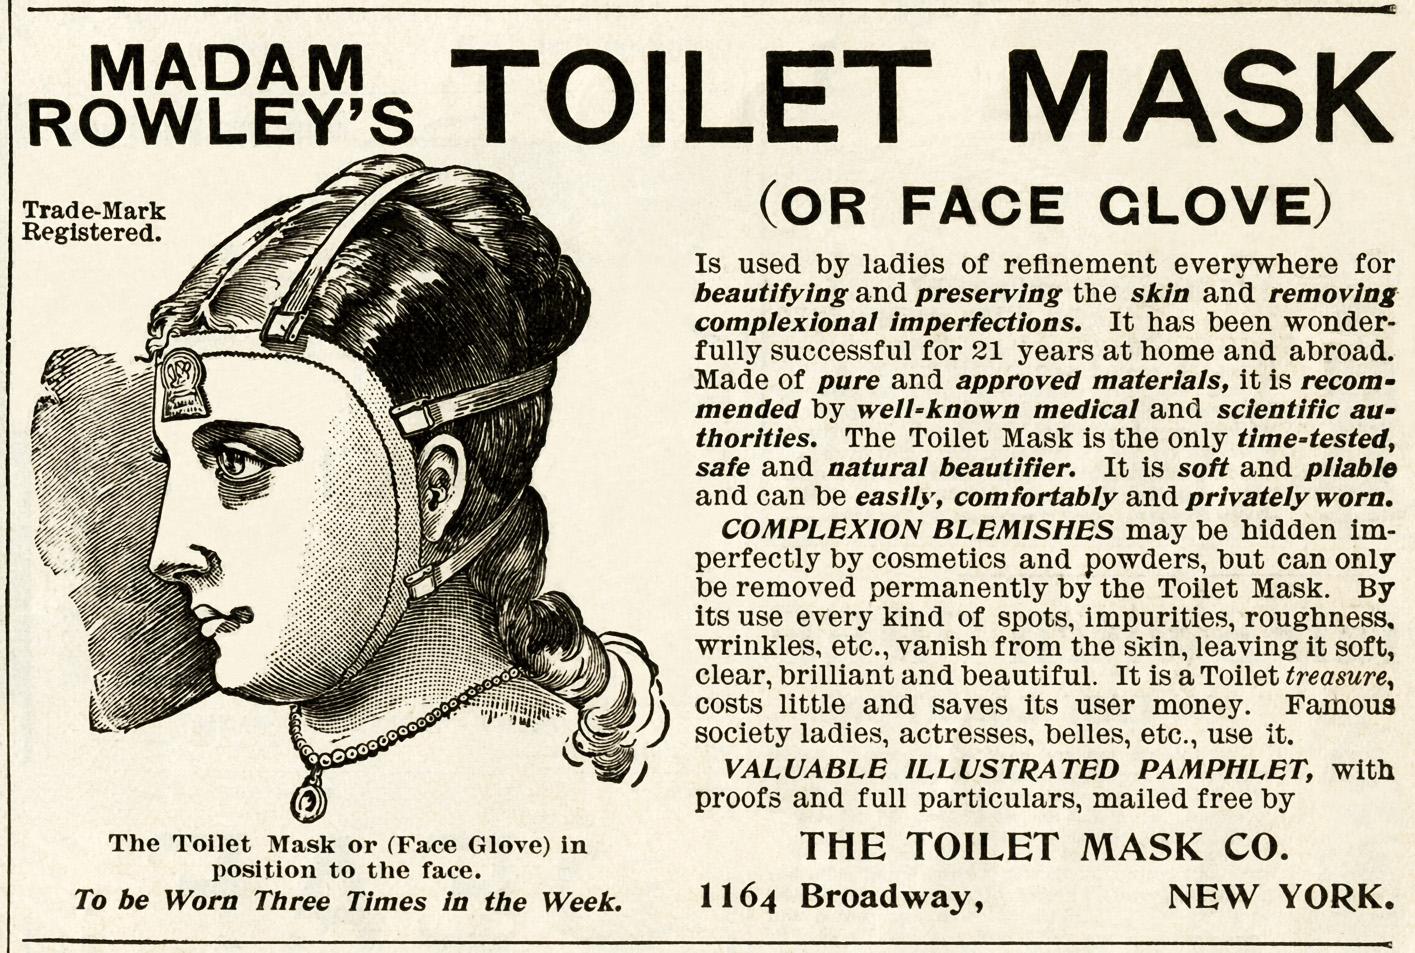 toilet mask ad, vintage beauty advertisement, madam rowley's toilet mask, free vintage beauty graphic, free printable ad, halloween mask digital image